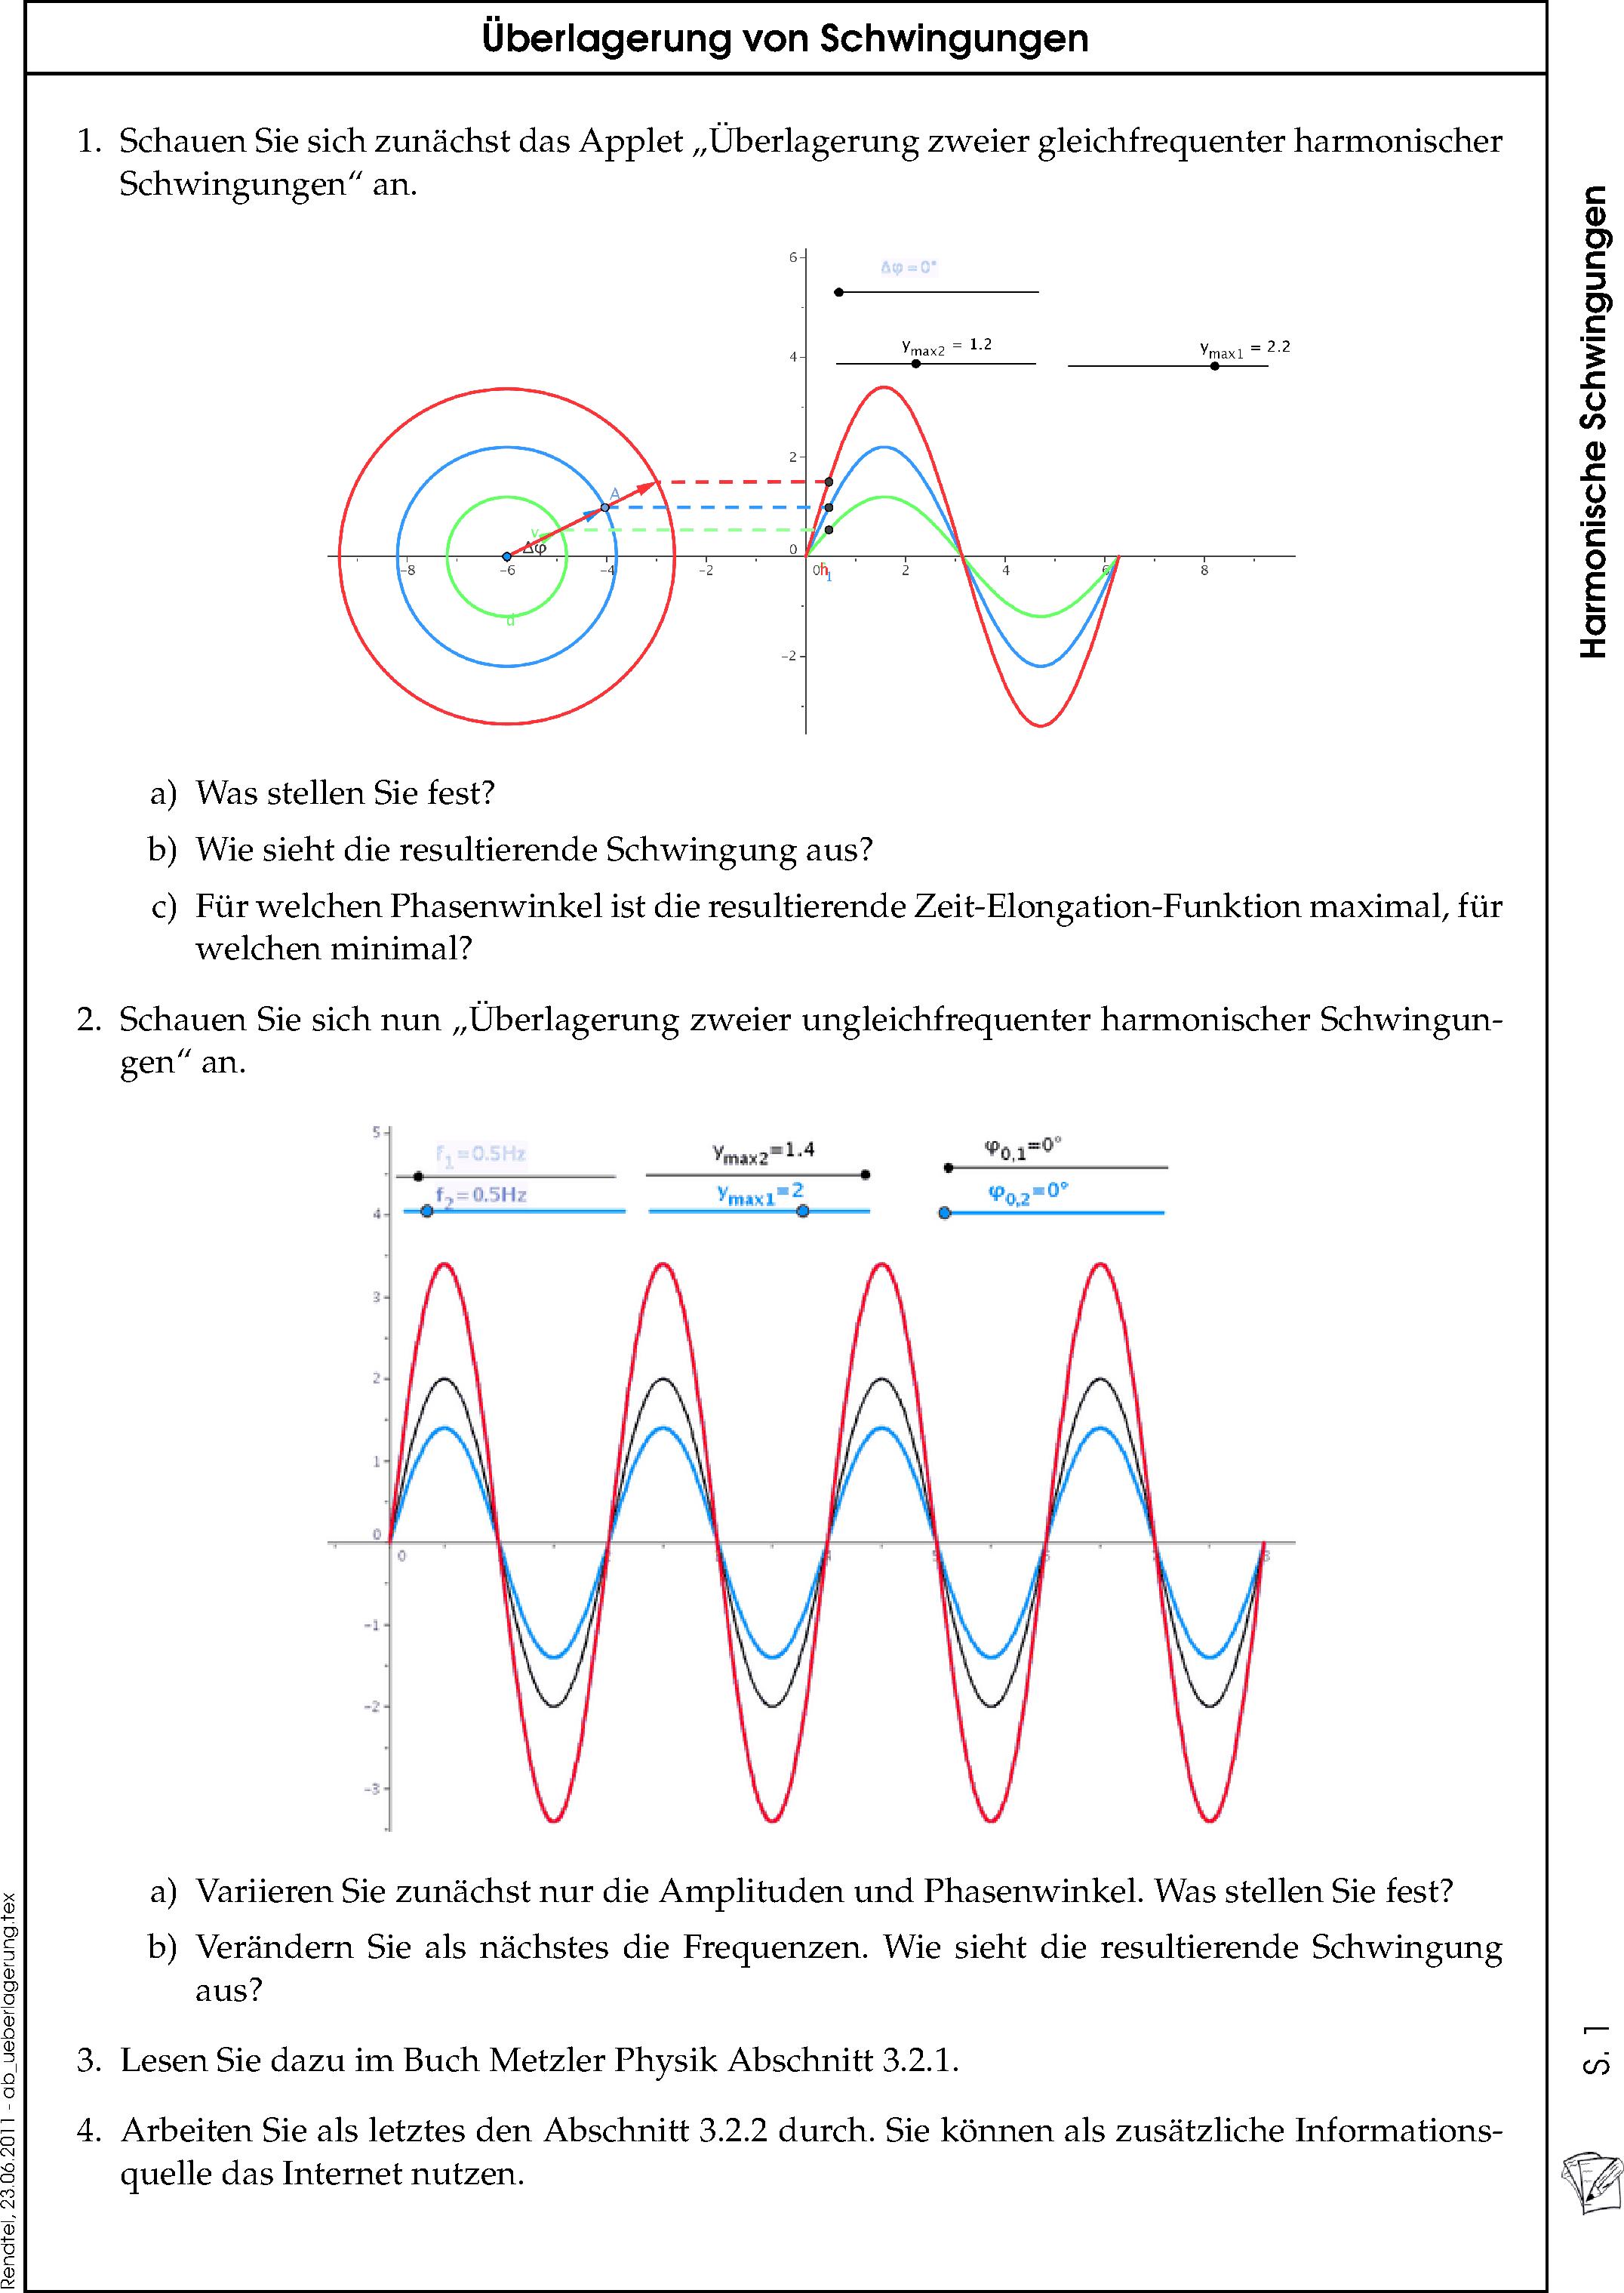 Rendtel.de: Schulmaterial -- Physik